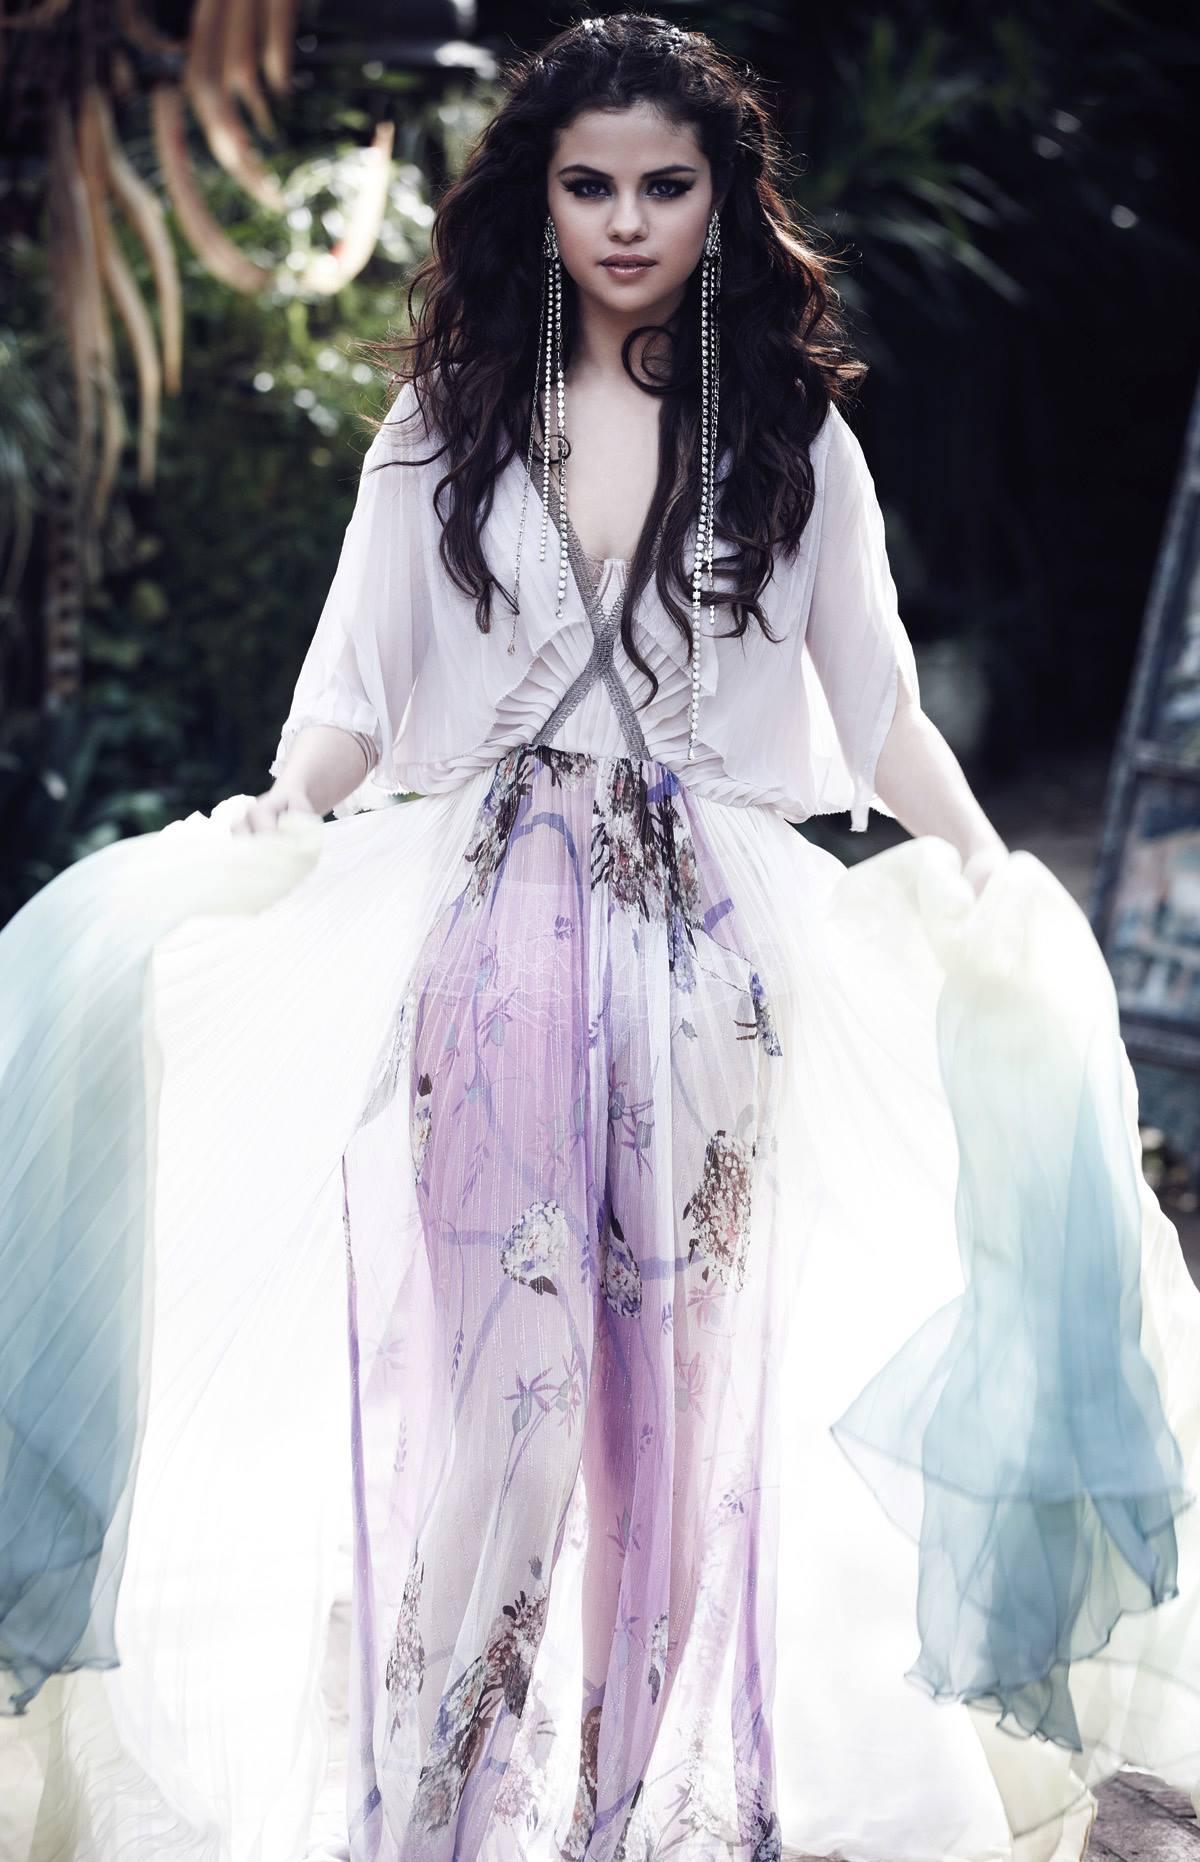 Selena Gomez: Stars Dance Album Photoshoot -06 - GotCeleb